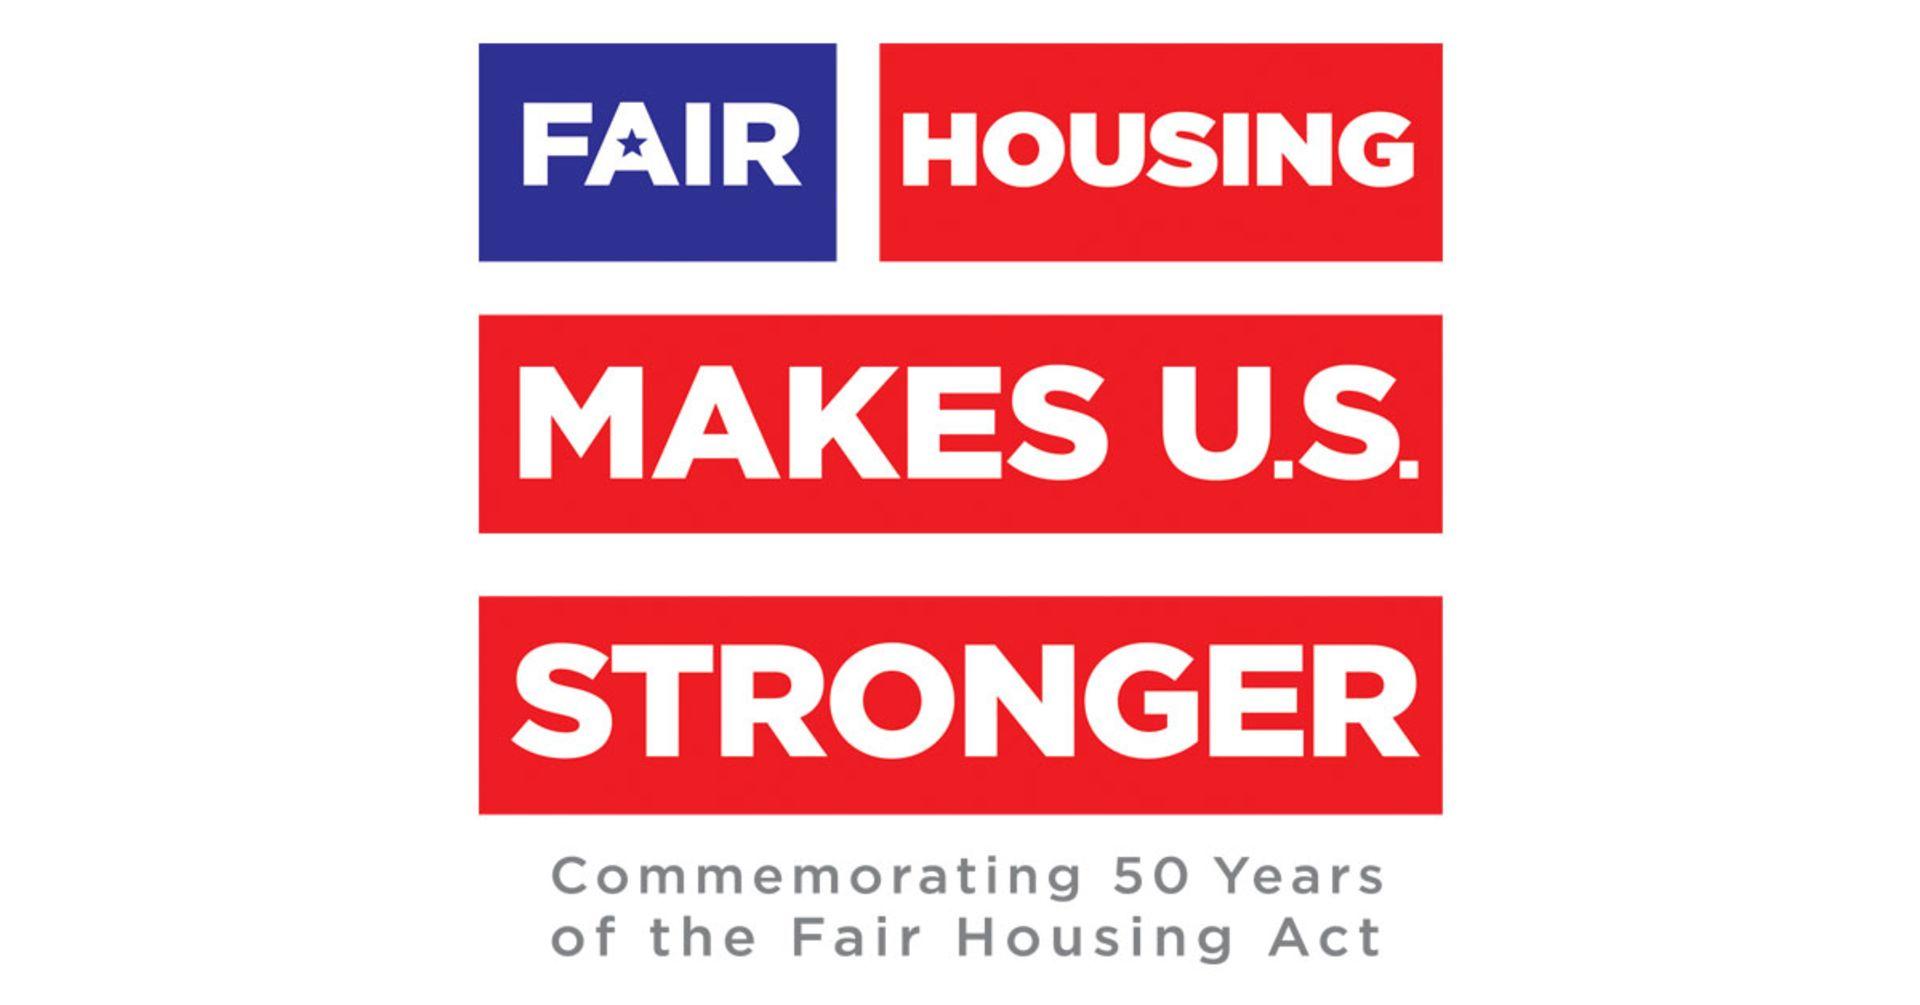 Moving Forward Toward Fair Housing